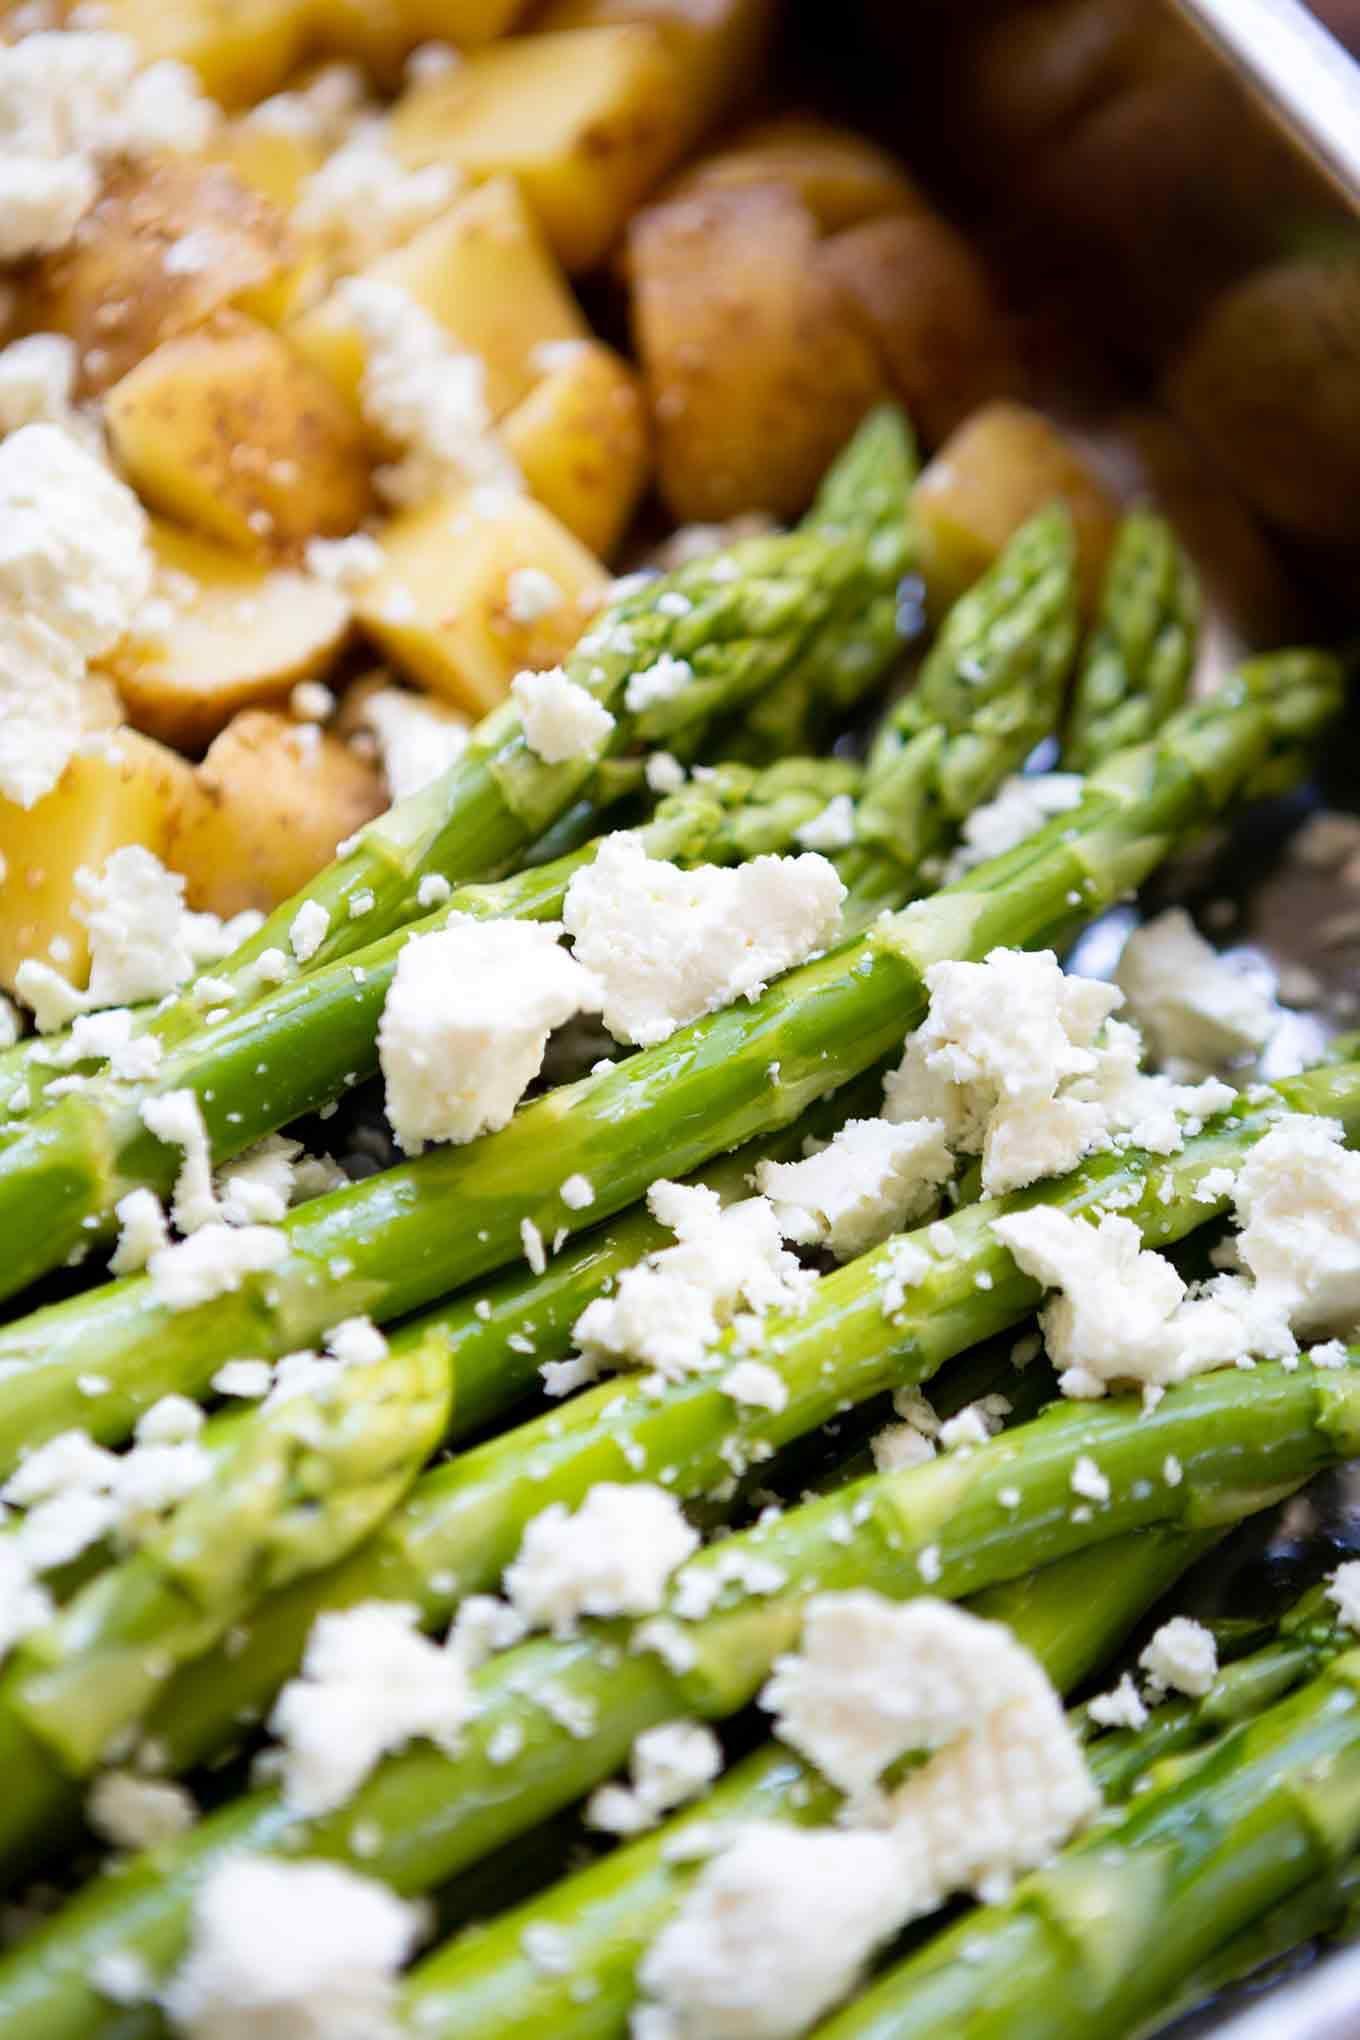 Sesam-Ofenkartoffeln mit grünem Spargel und Feta (1 Blech!) - Kochkarussell